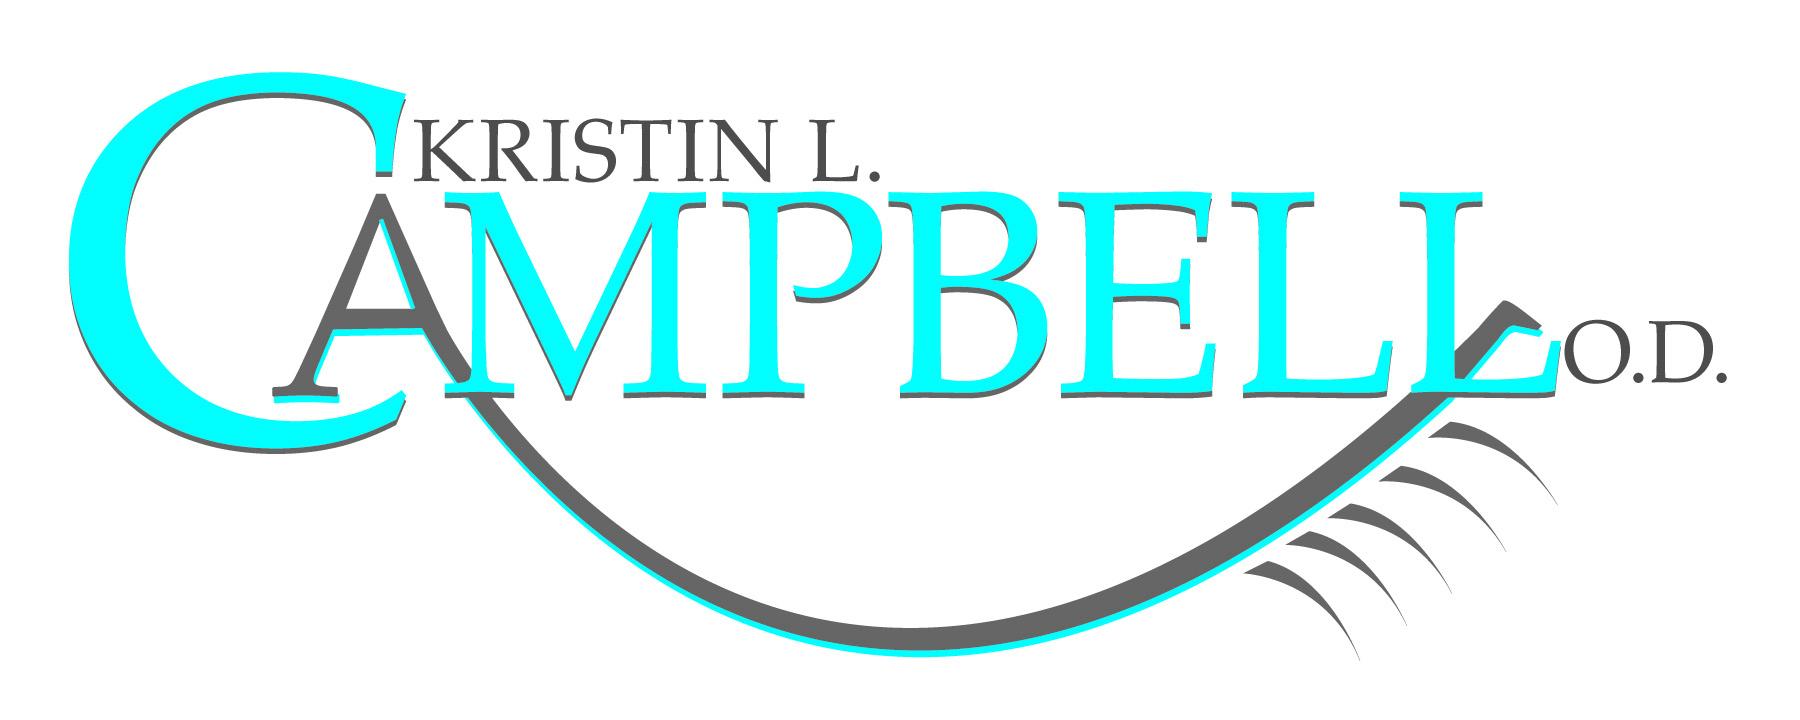 Kristin L. Campbell,OD Logo